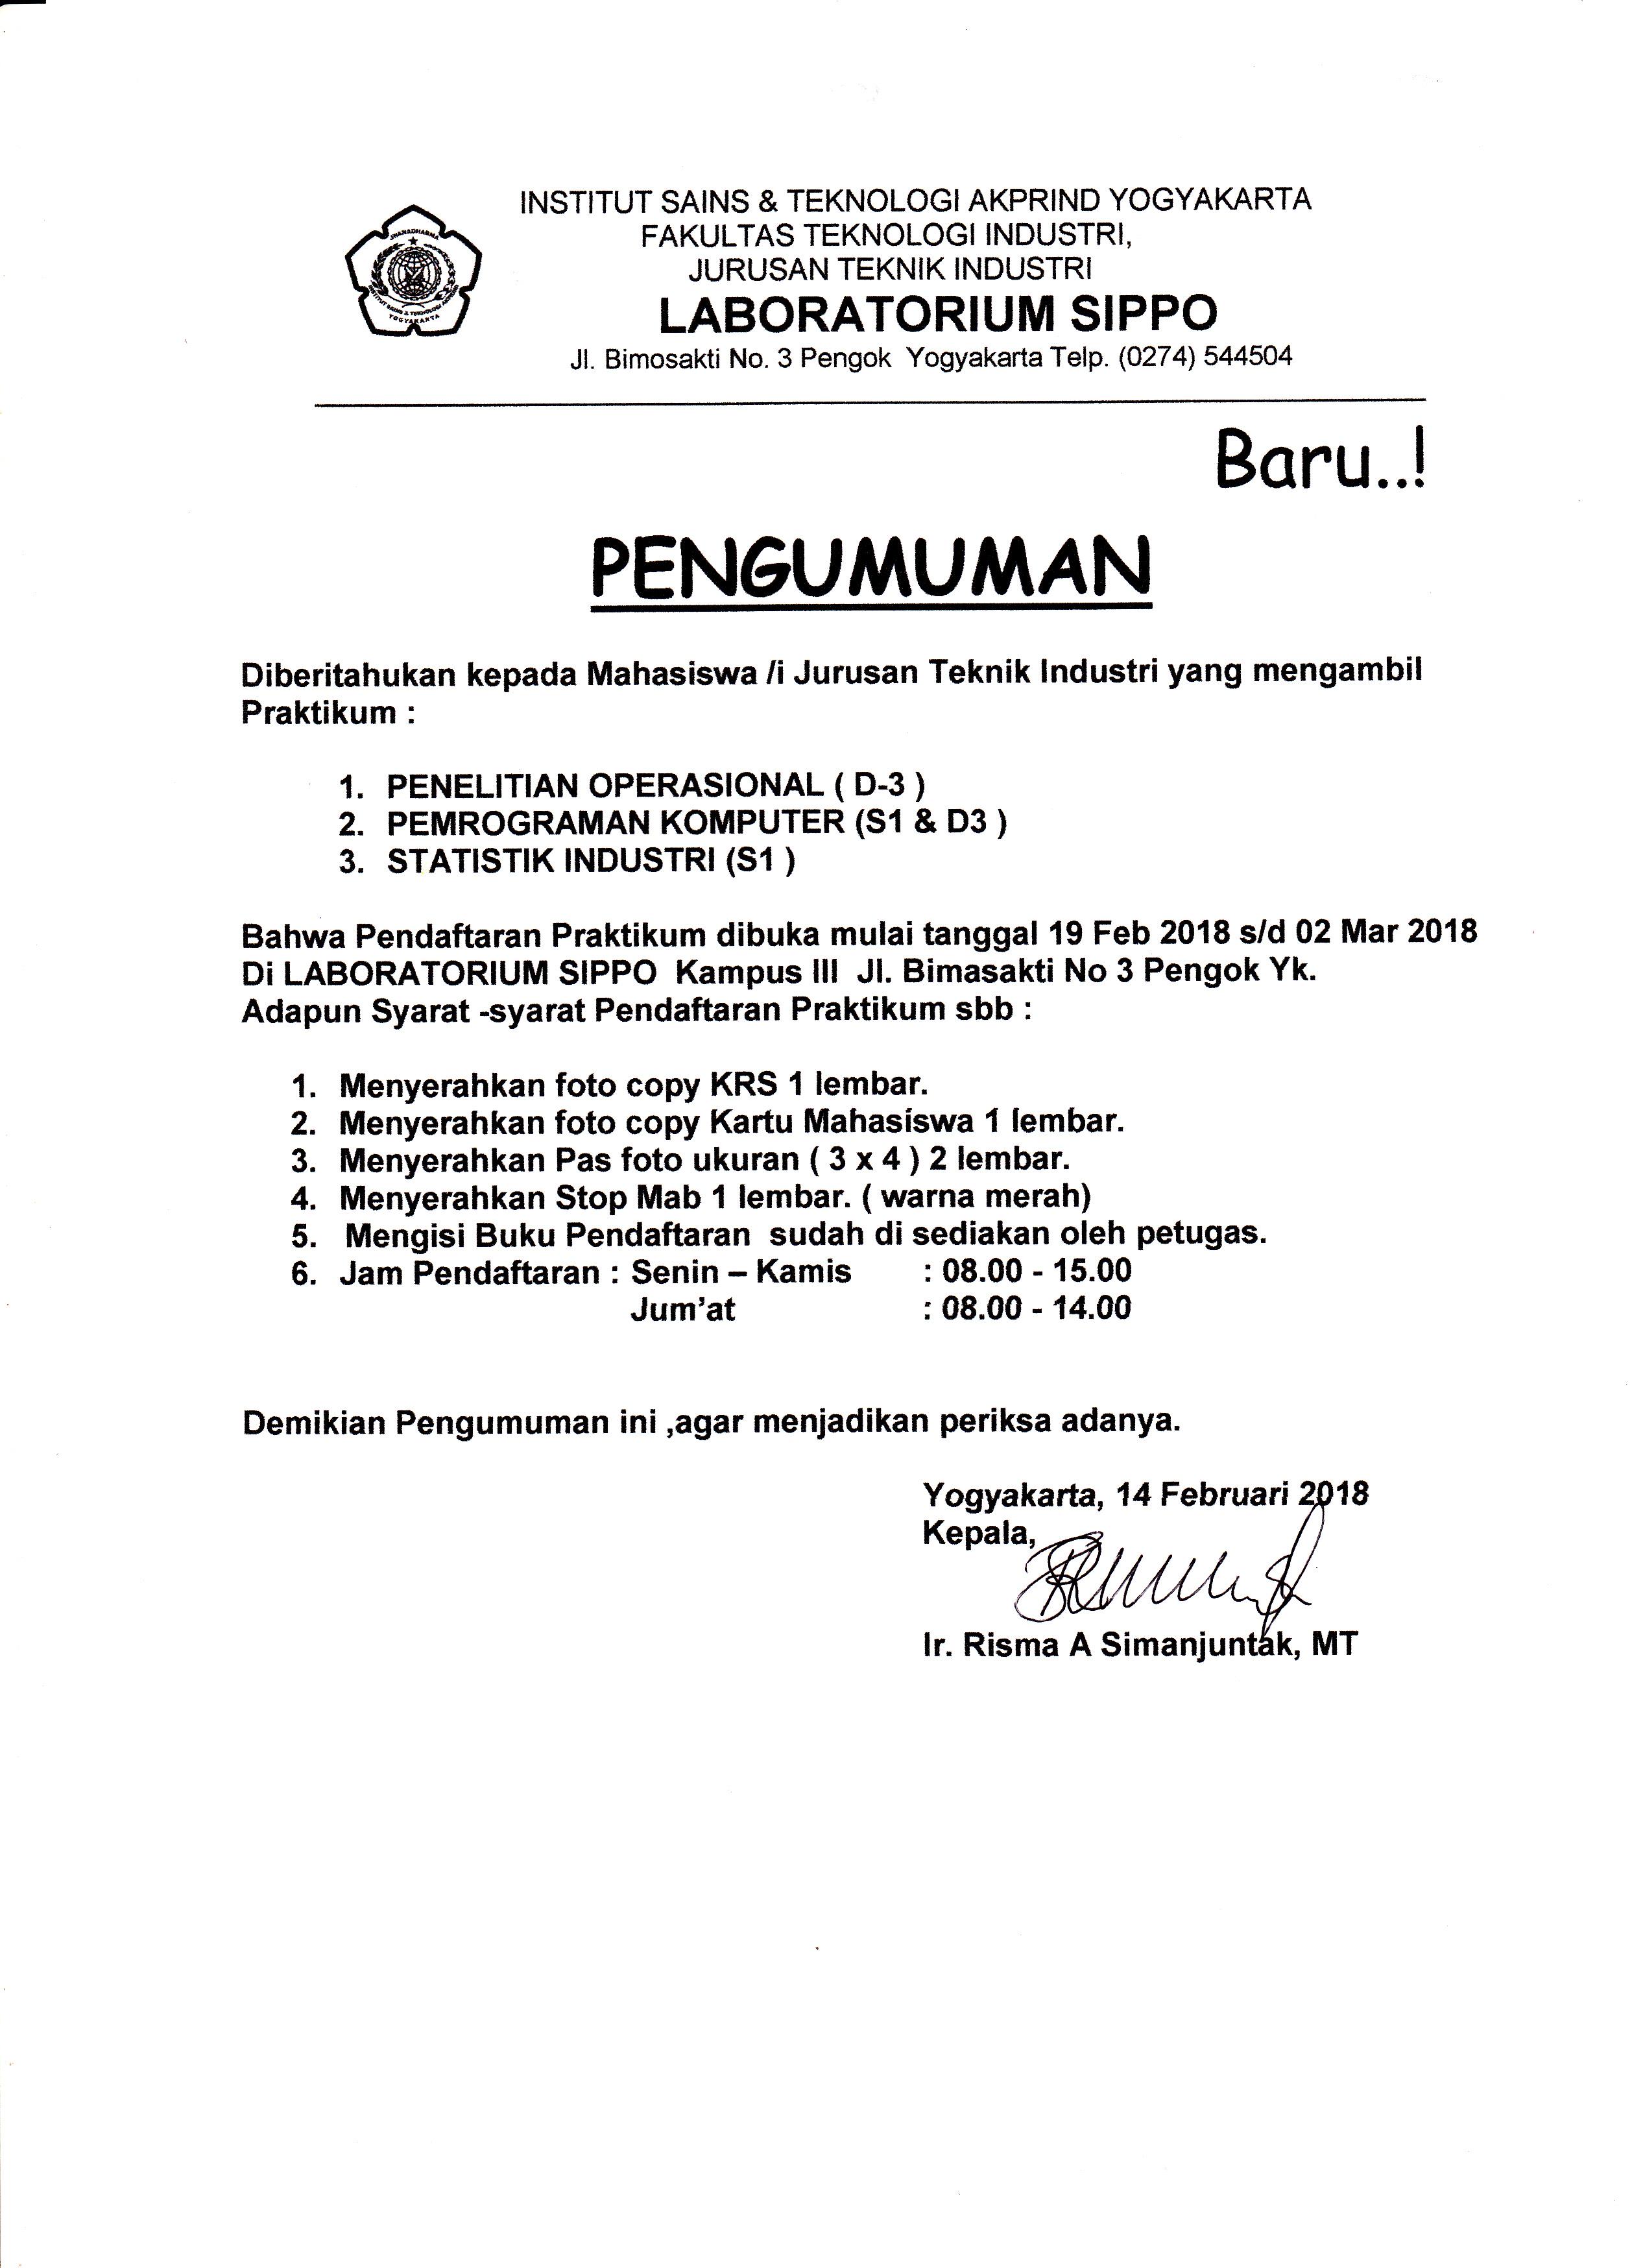 Pendaftaran Praktikum di Laboratorium SIPPO Jurusan Teknik Industri IST AKPRIND Yogyakarta